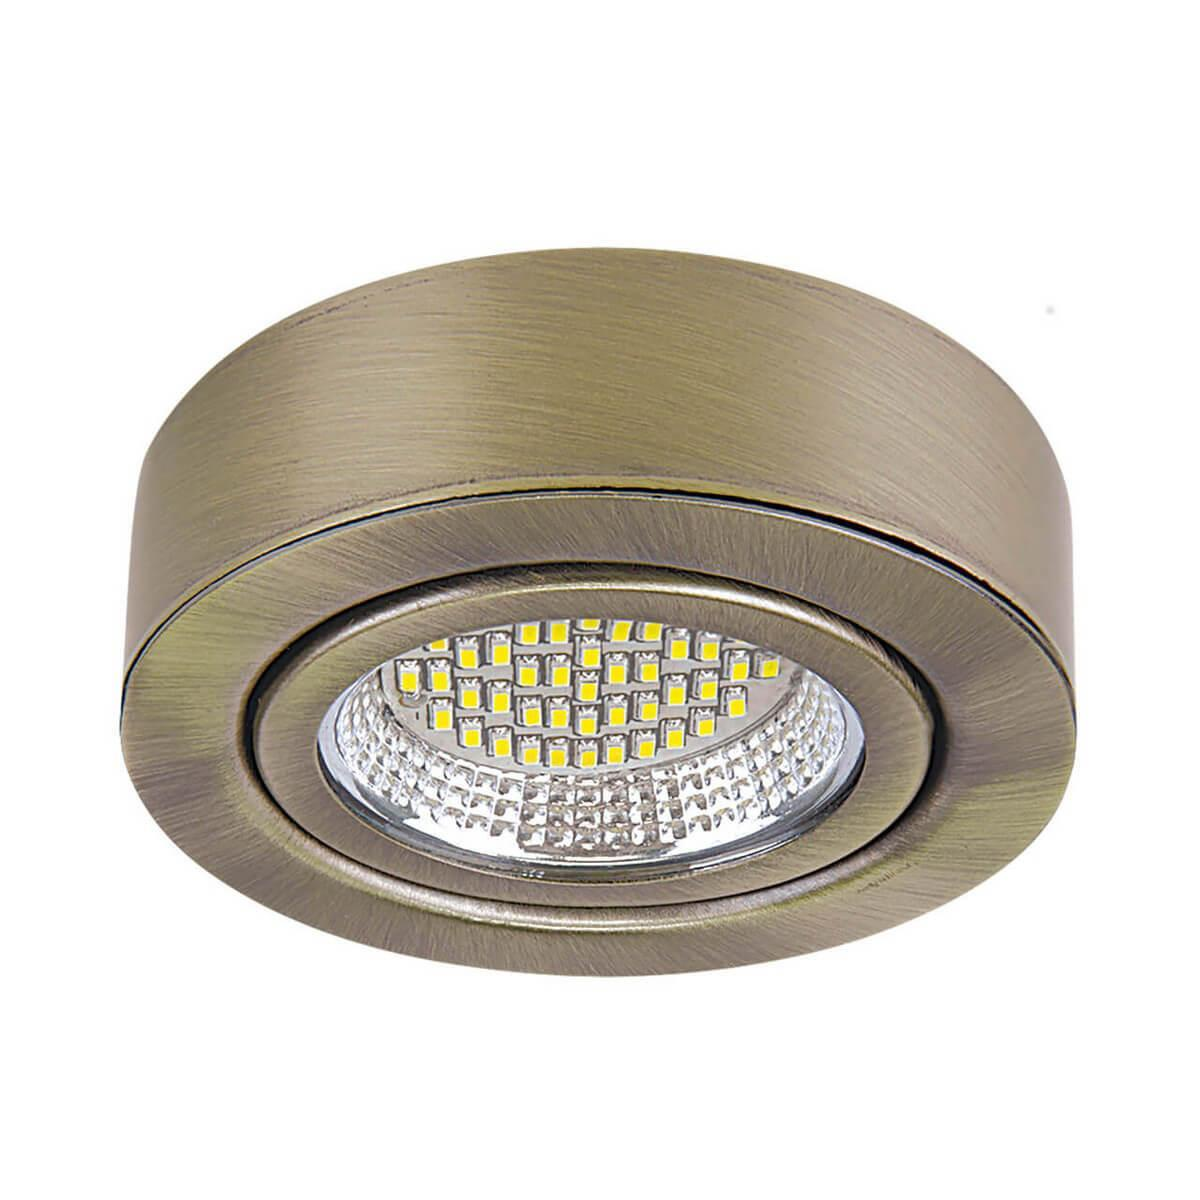 Декоративный светильник Lightstar 003331, LED, 3 Вт lightstar lightstar g5 3 3w 4200k 940904